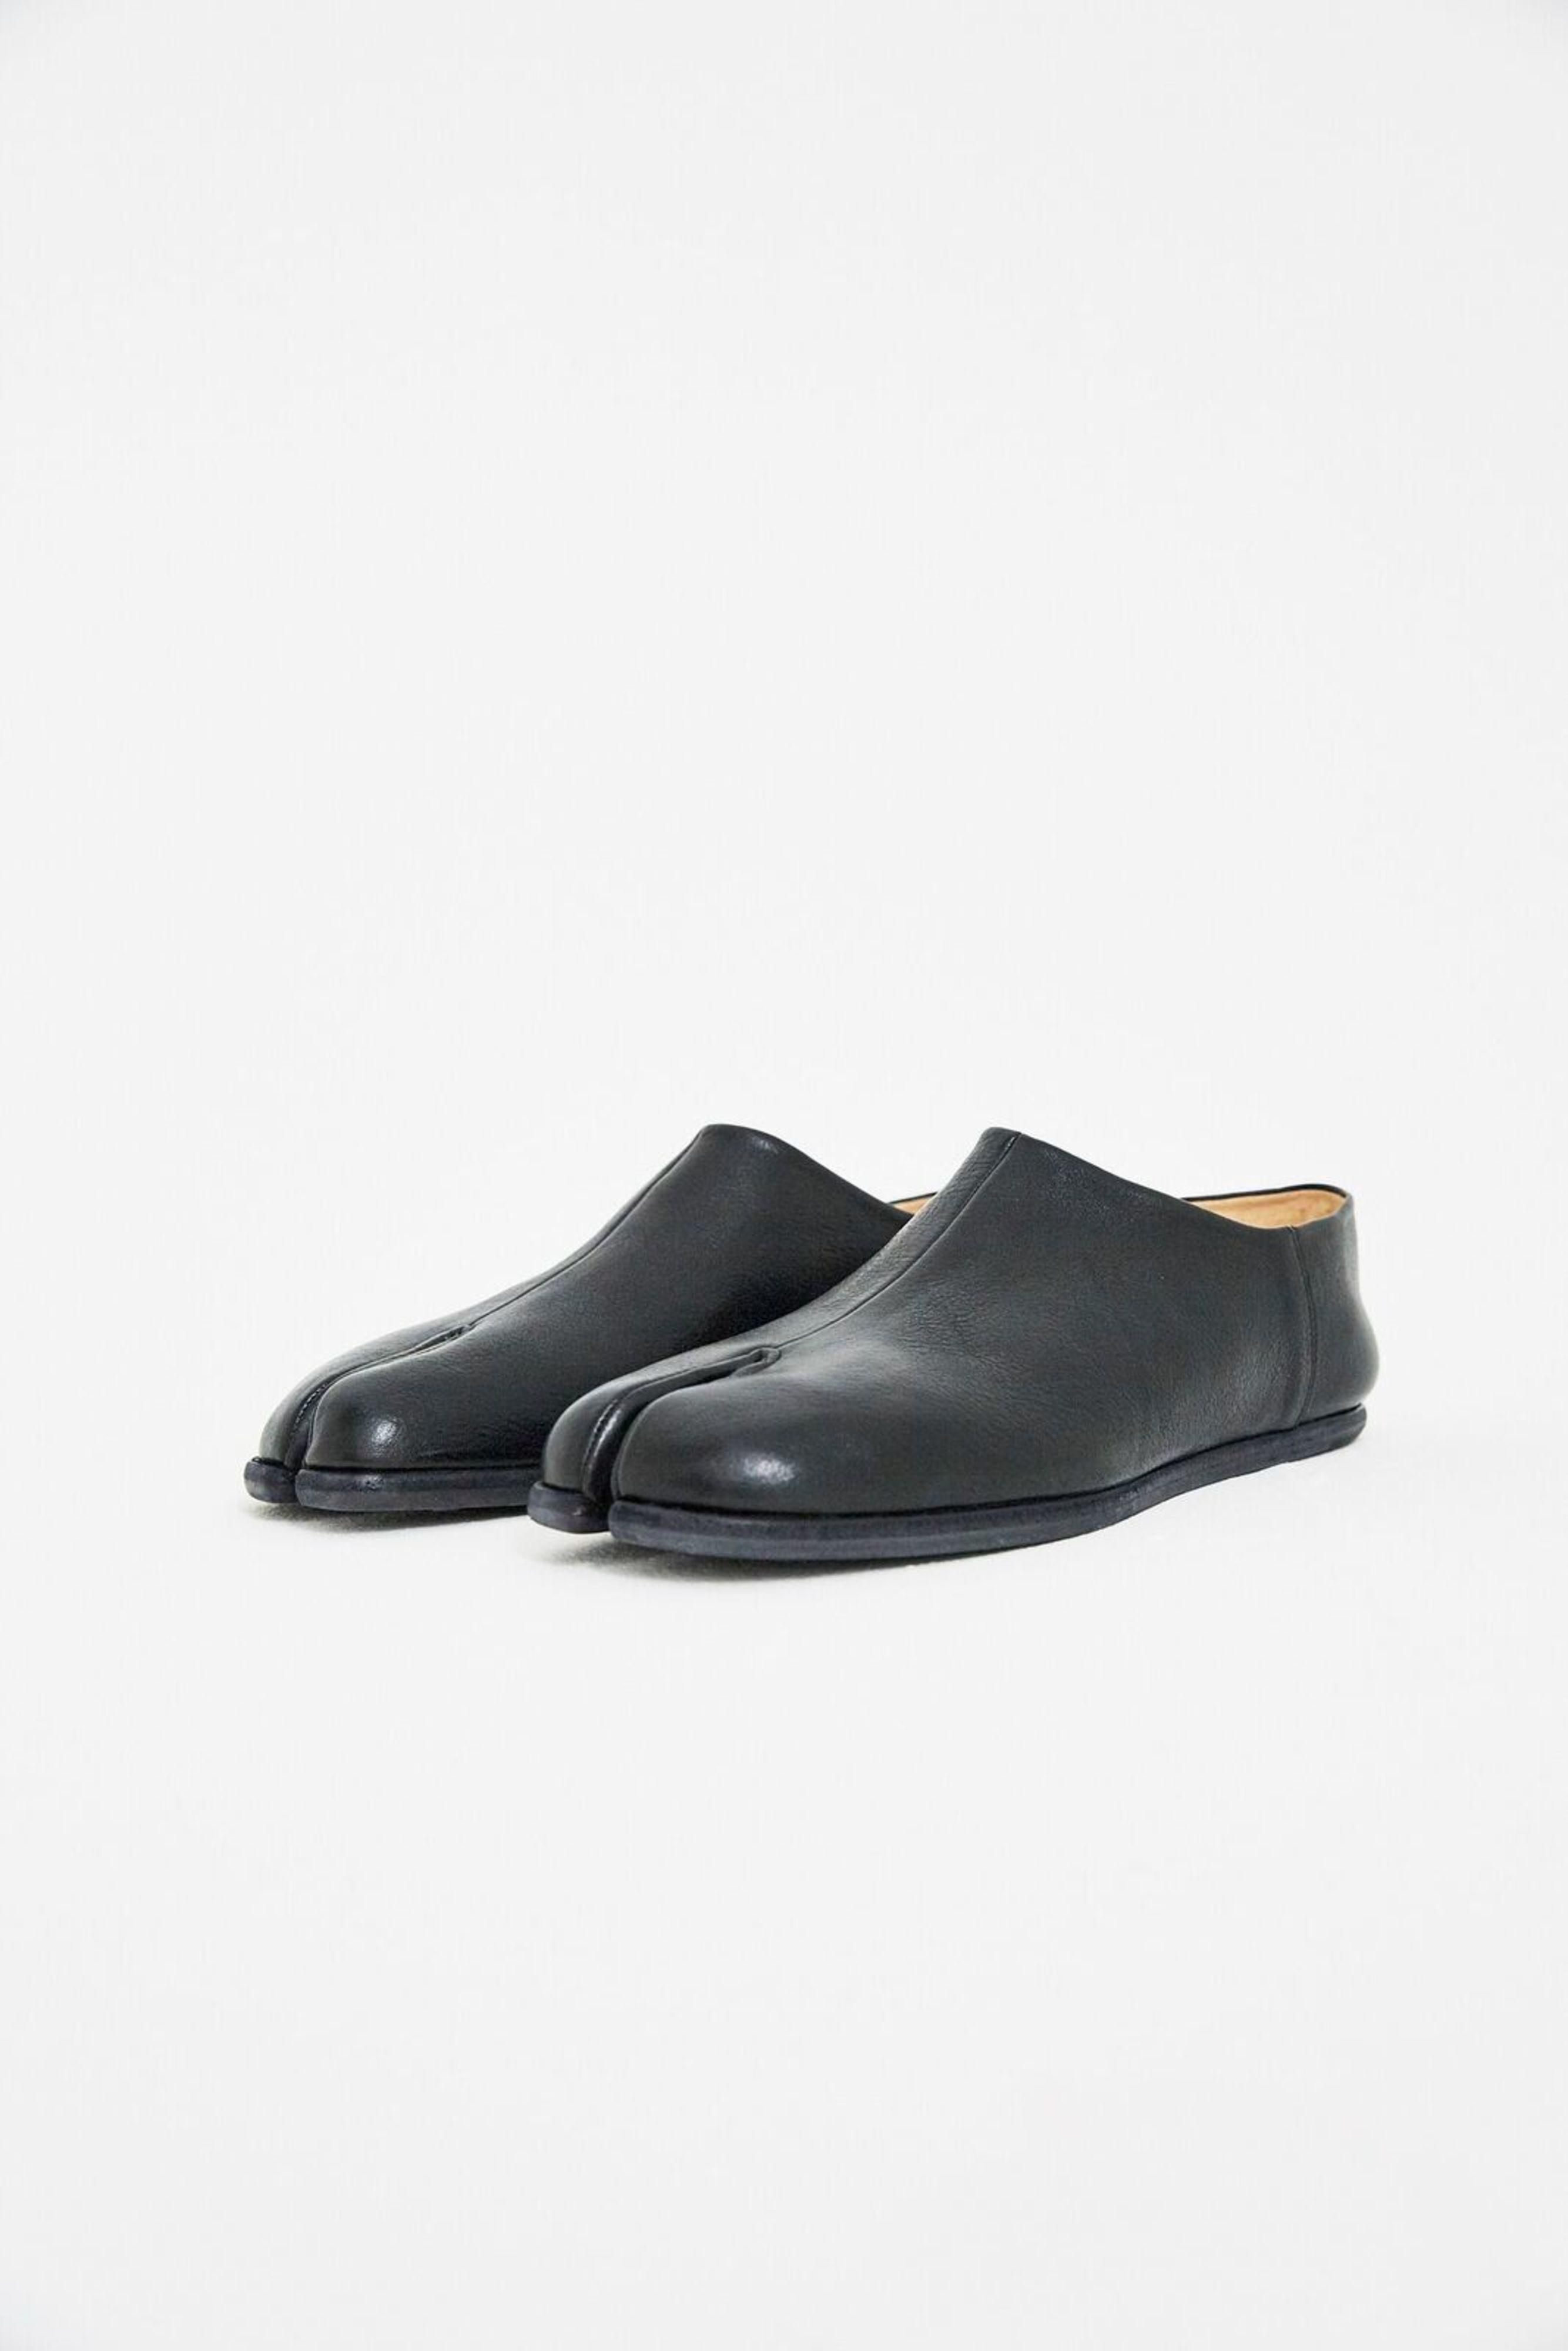 28d5f93717d Lyst - Maison Margiela Black Leather ... Mens Clothing Styles